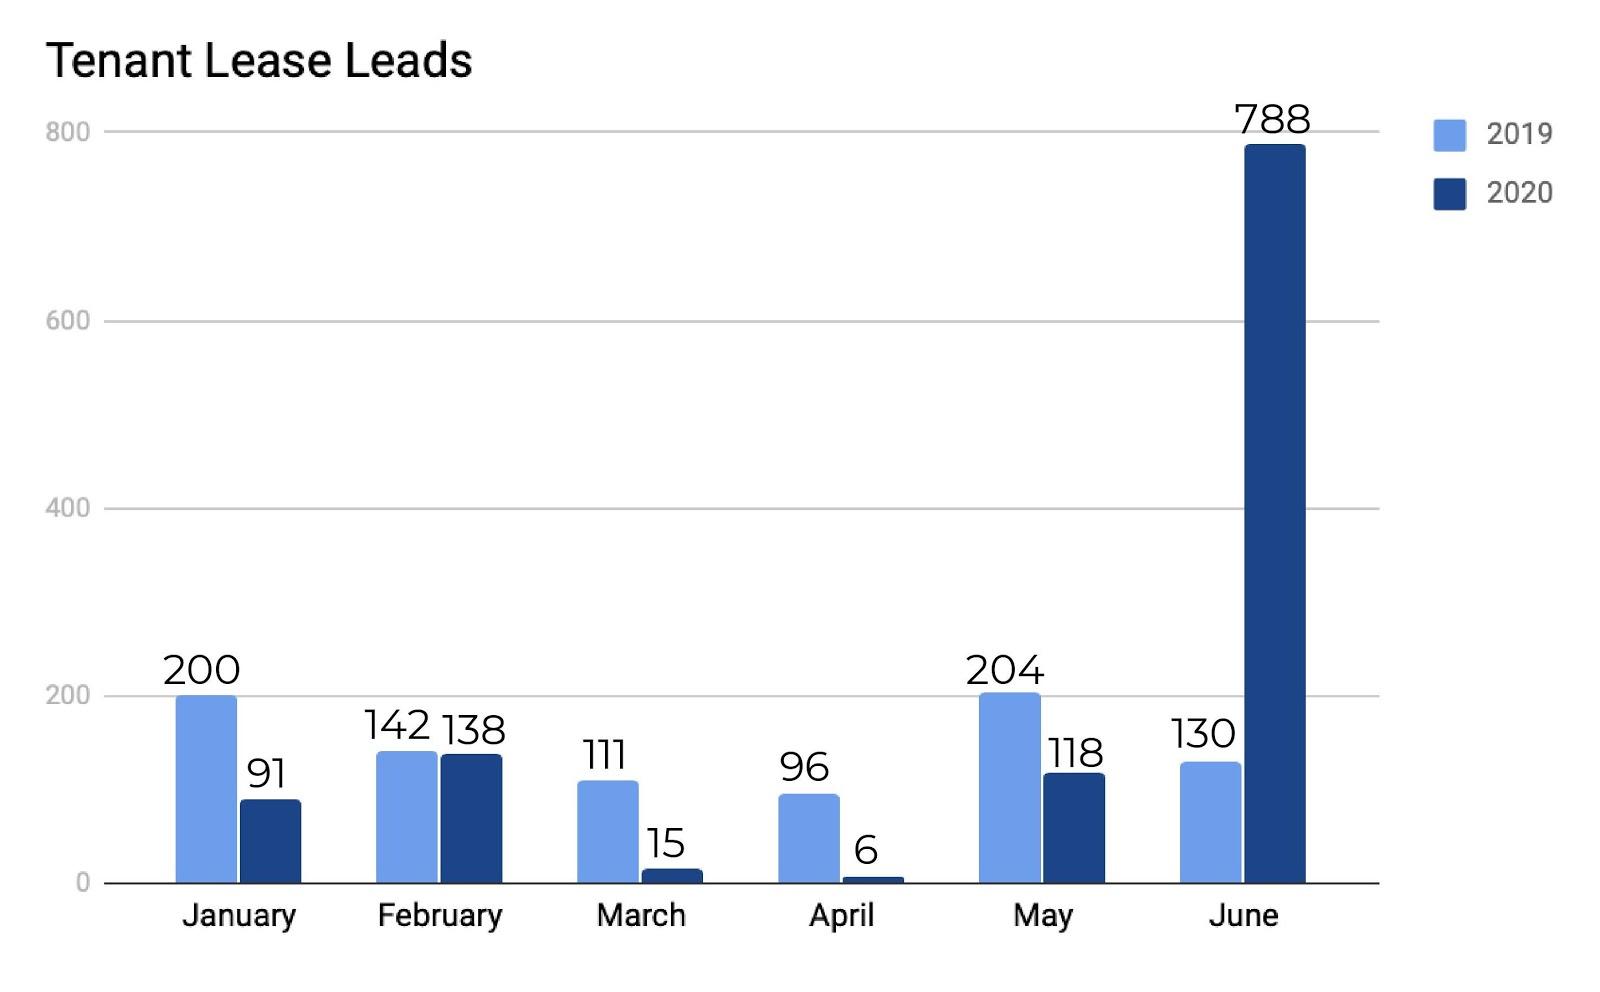 June Tenant Lease Leads